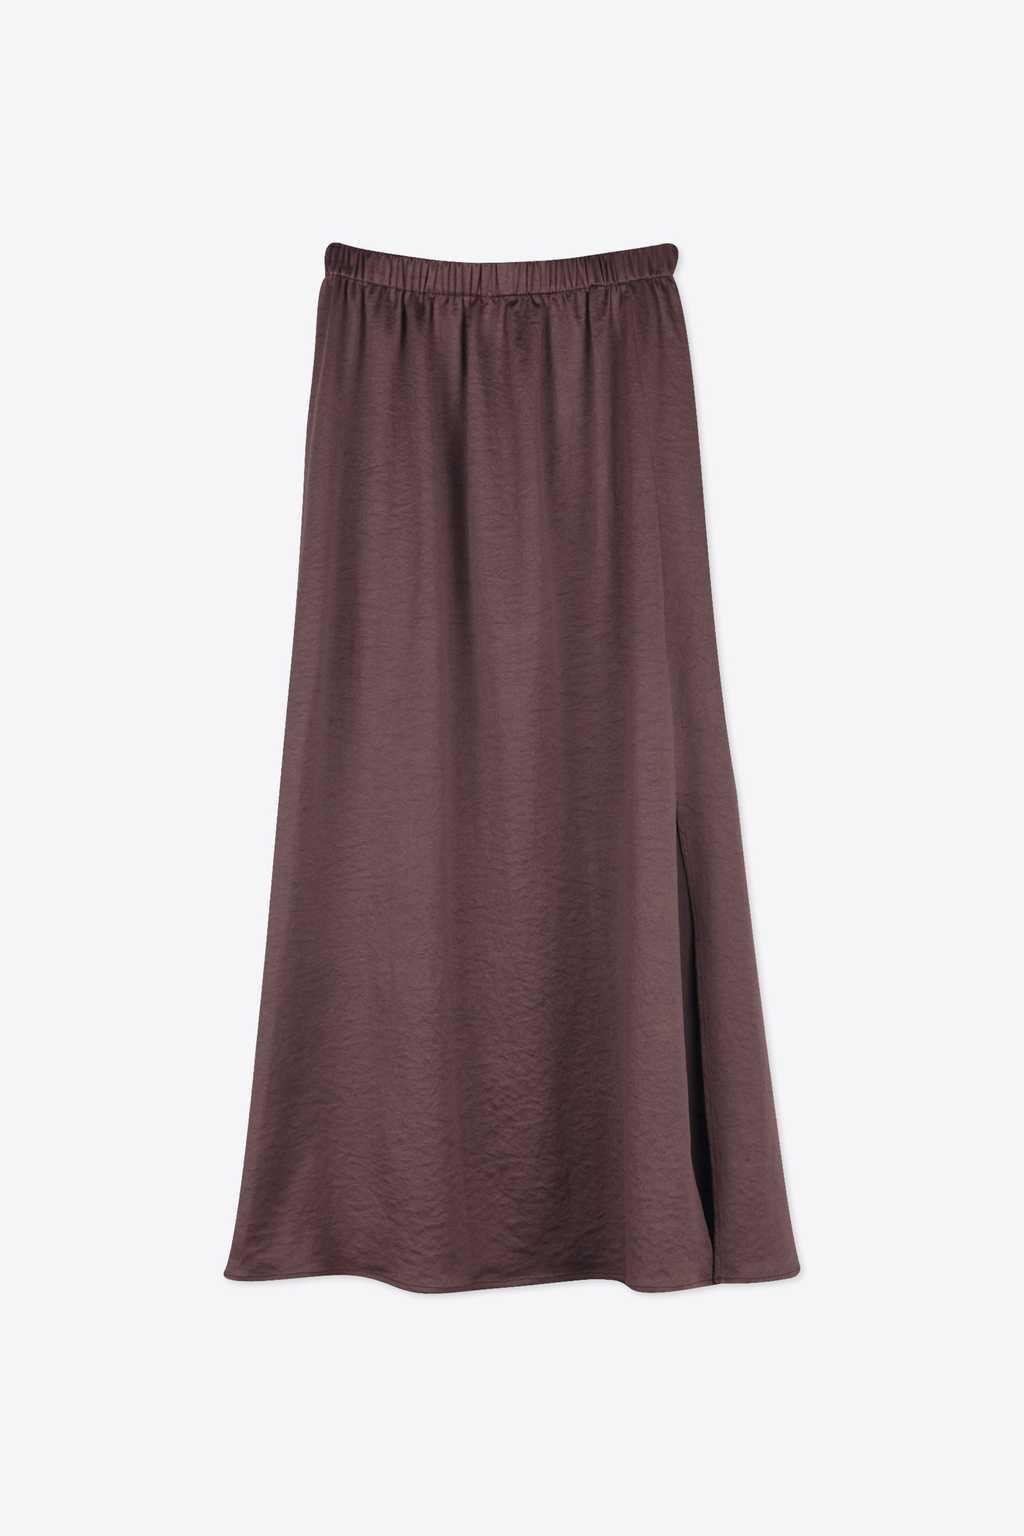 Skirt 1316 Burgundy 11